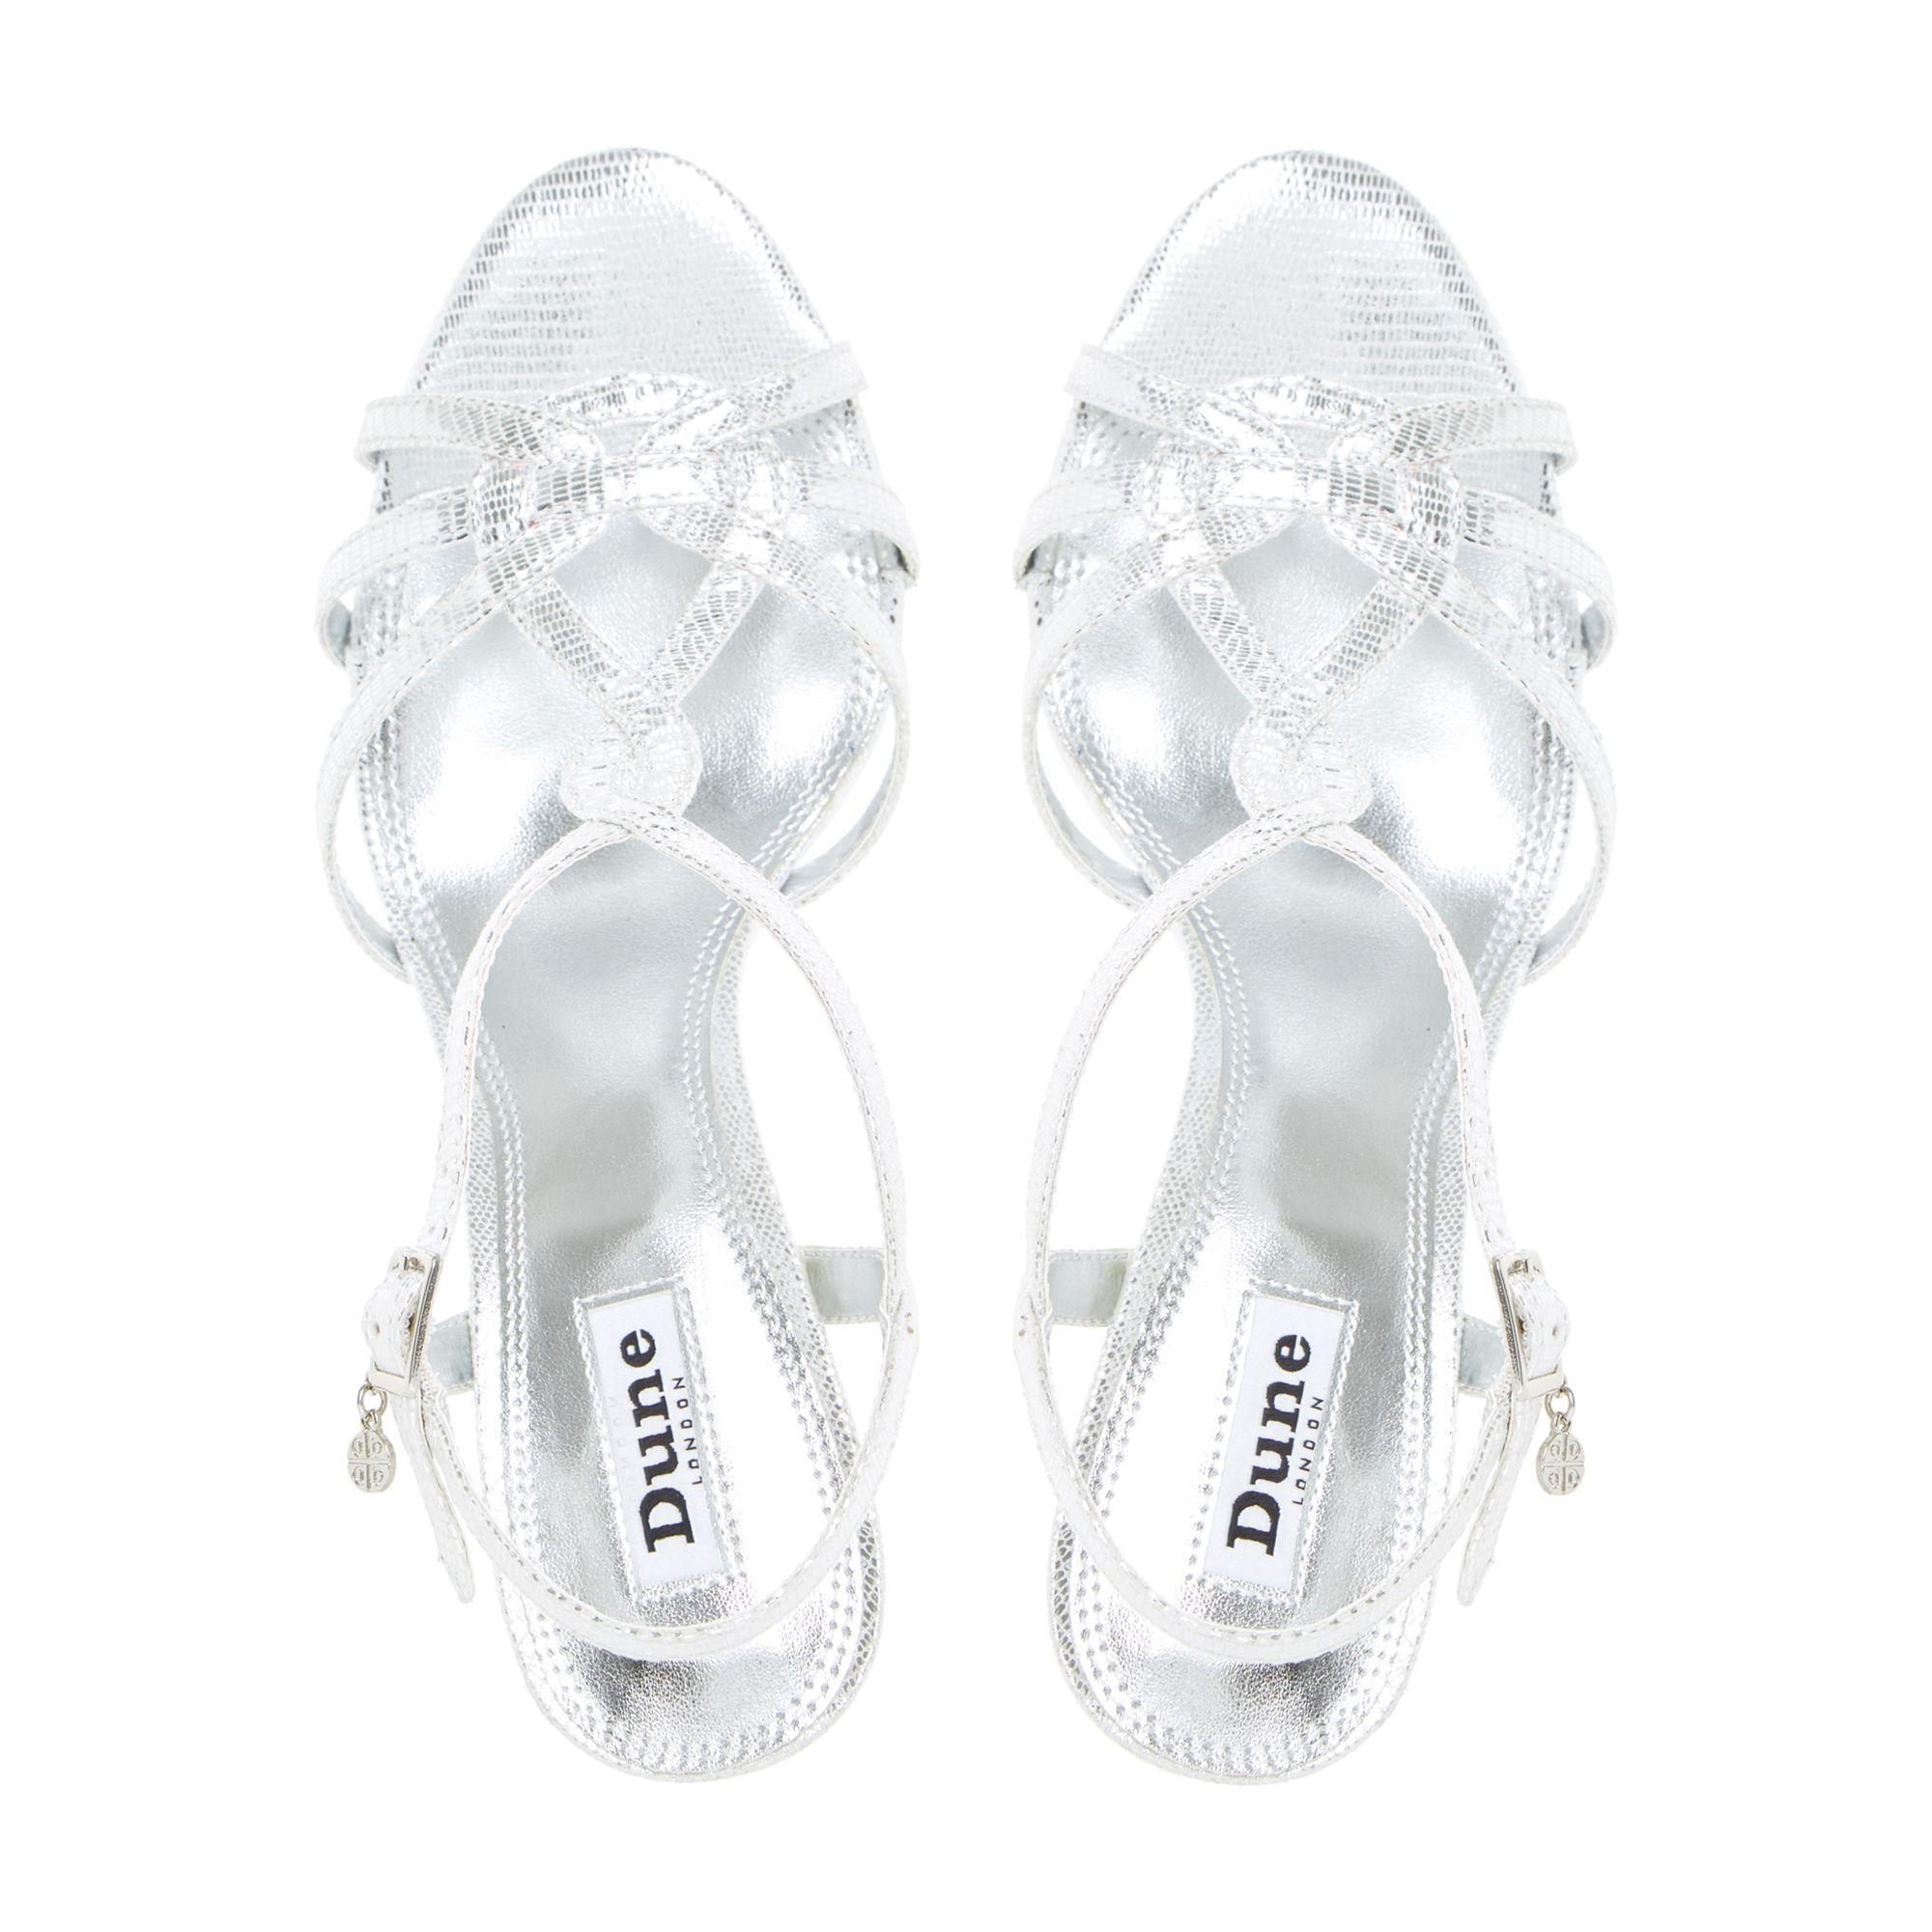 44c6dbb115a Dune Silver  miniee  Strappy Mid Heel Sandals in Metallic - Lyst